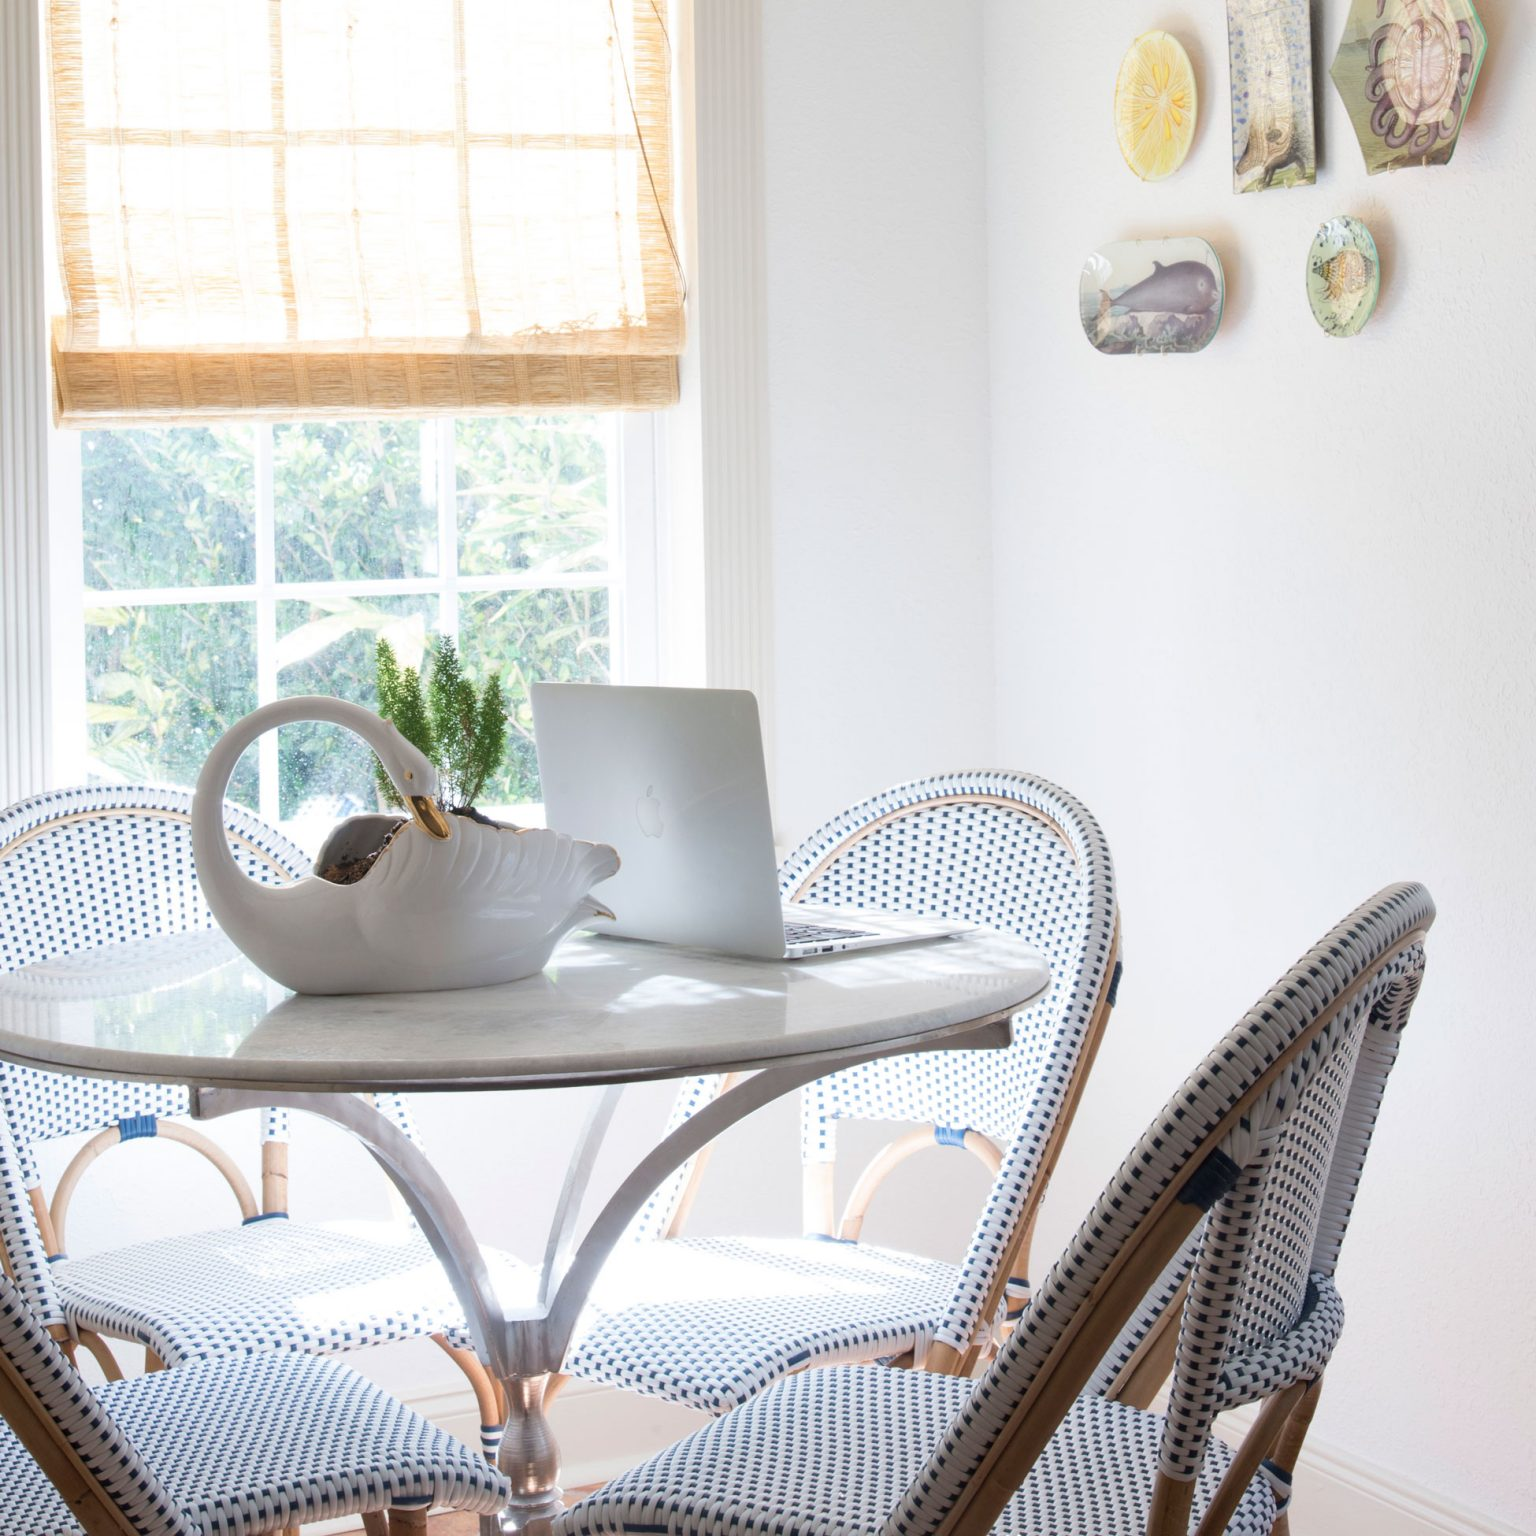 Twosdays – 1 room 2 price points – Bright Breakfast